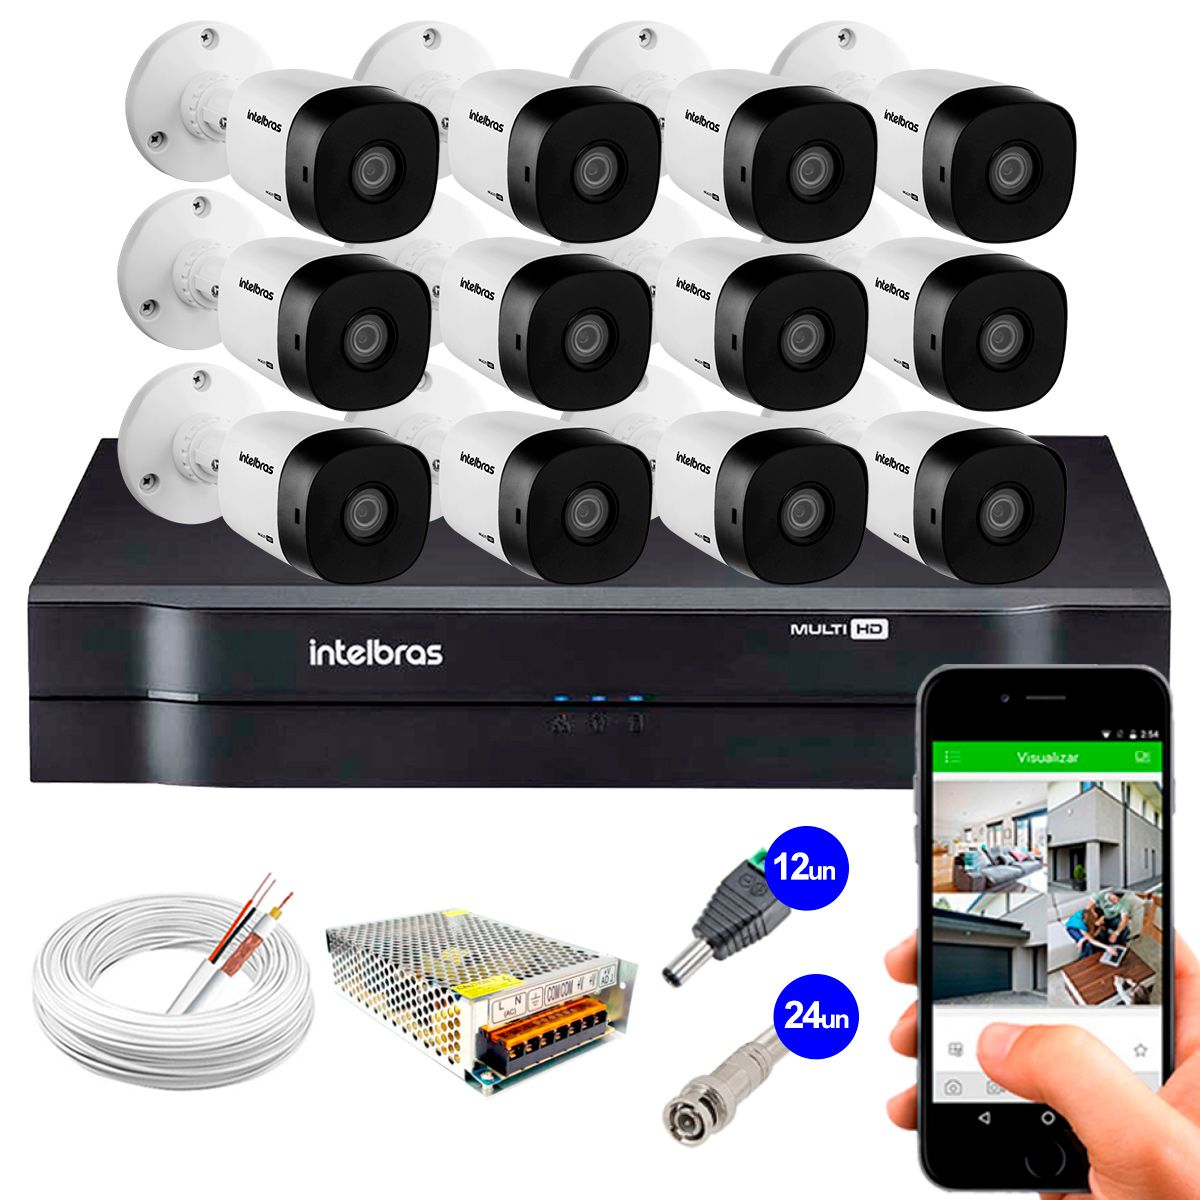 Kit 12 Câmeras VHD 1010 B G5 + DVR Intelbras + App Grátis, HD 720p 10m Infravermelho + Cabos e Acessórios  - Tudo Forte